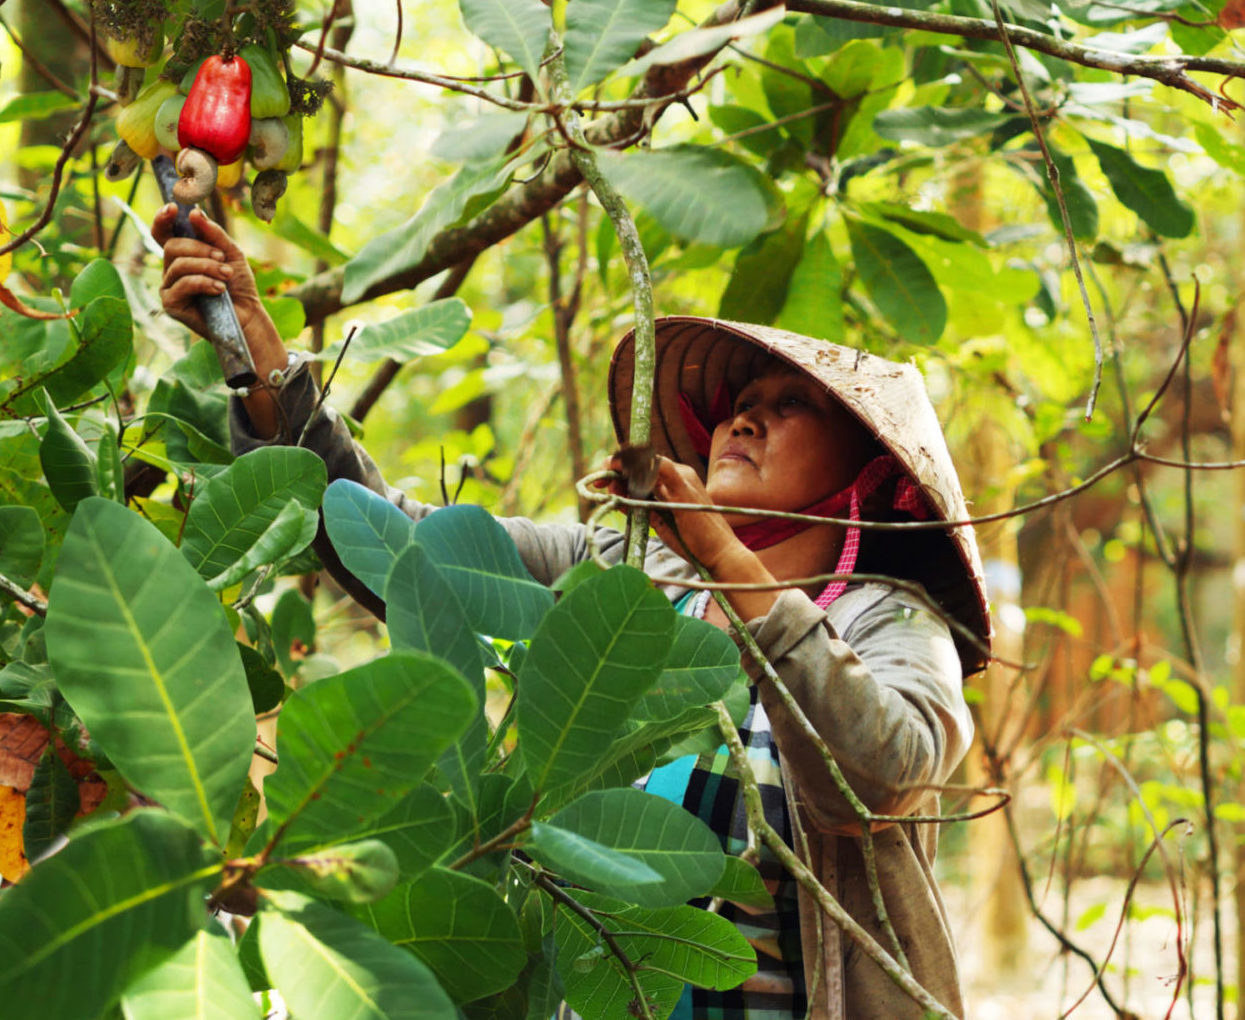 Cashew nuts from Vietnam: certified Fair trade